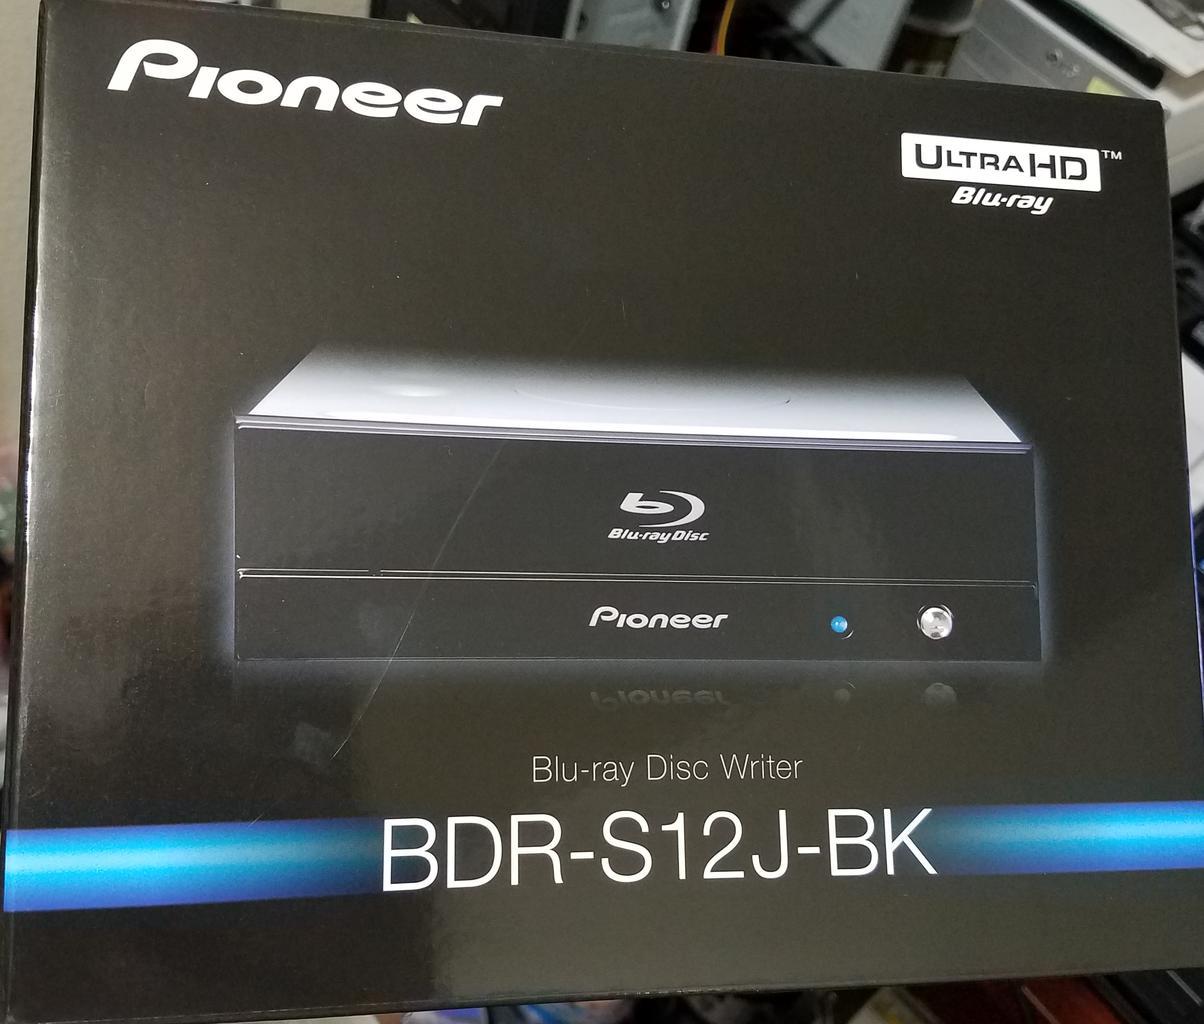 https://forum.cdrinfo.pl/attachments/f107/133667d1551419795-pioneer-bdr-s12j-bk-bdr-s12j-x-bdr-212-ultra-hd-blu-ray-box-front.jpg